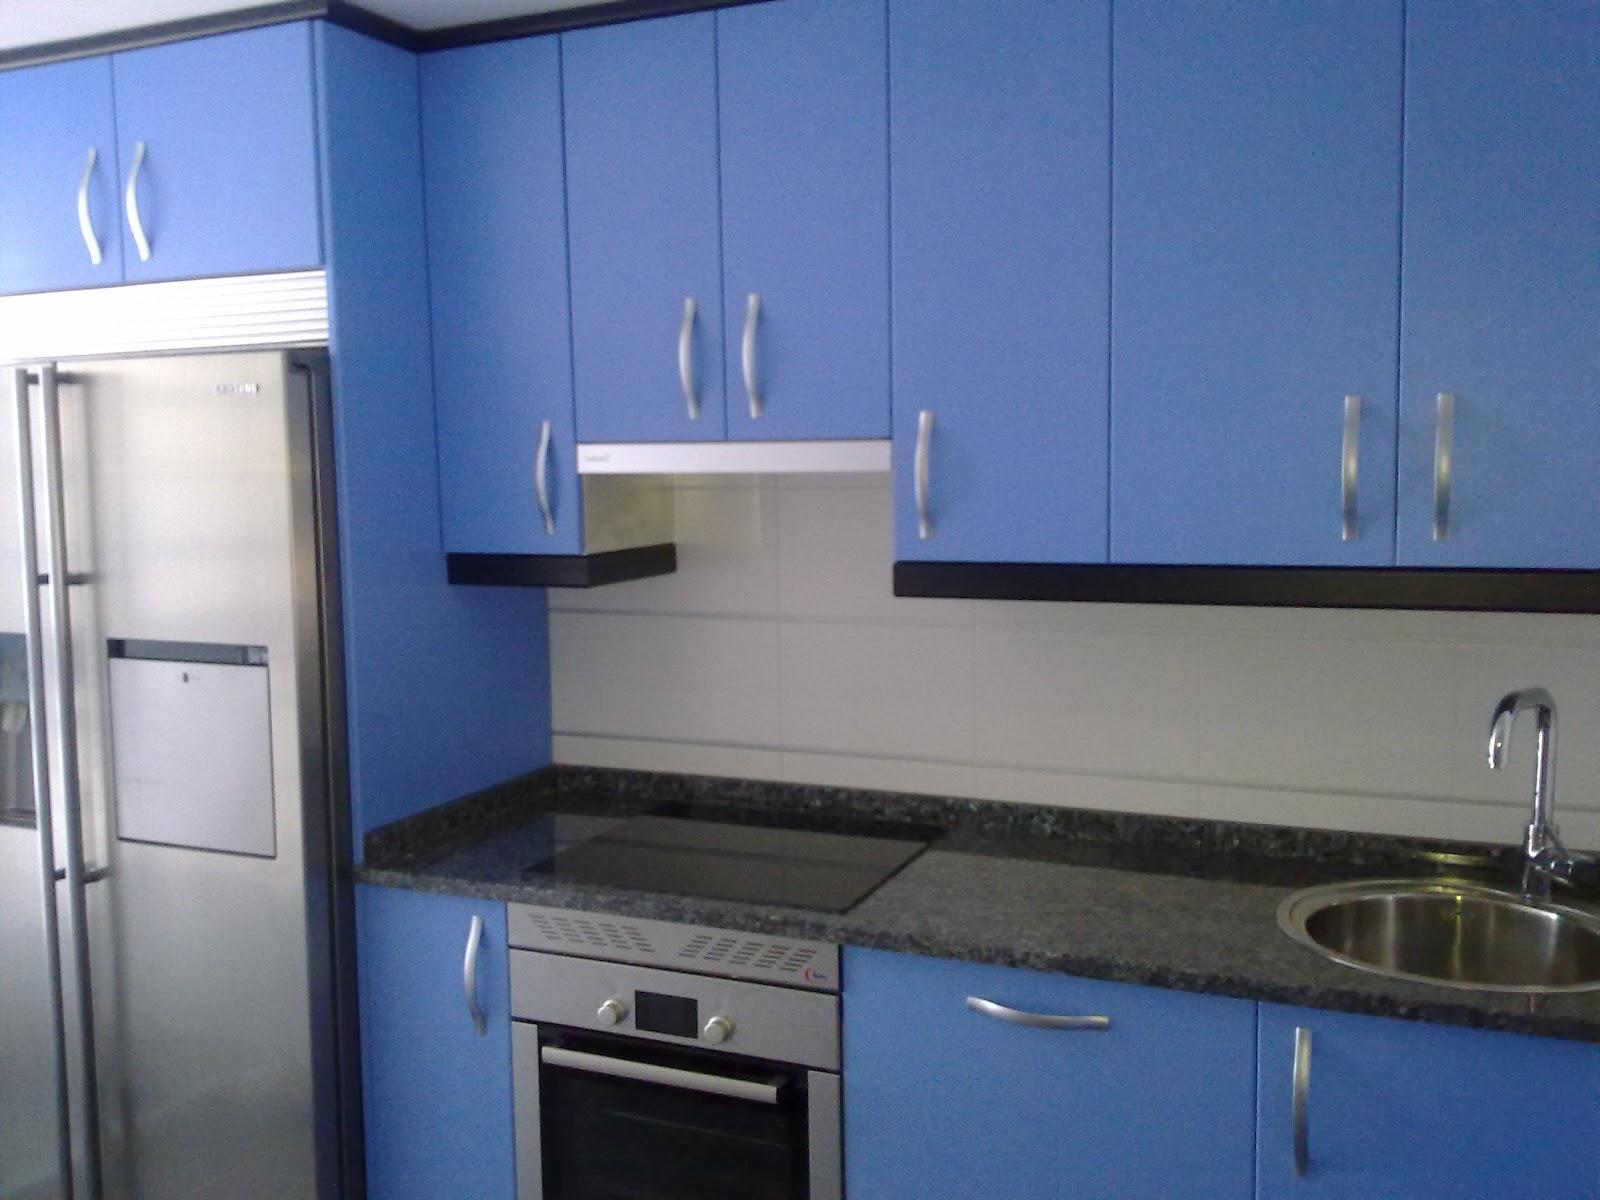 Laminado azul mate encimera granito labrador claro for Granito colores claros